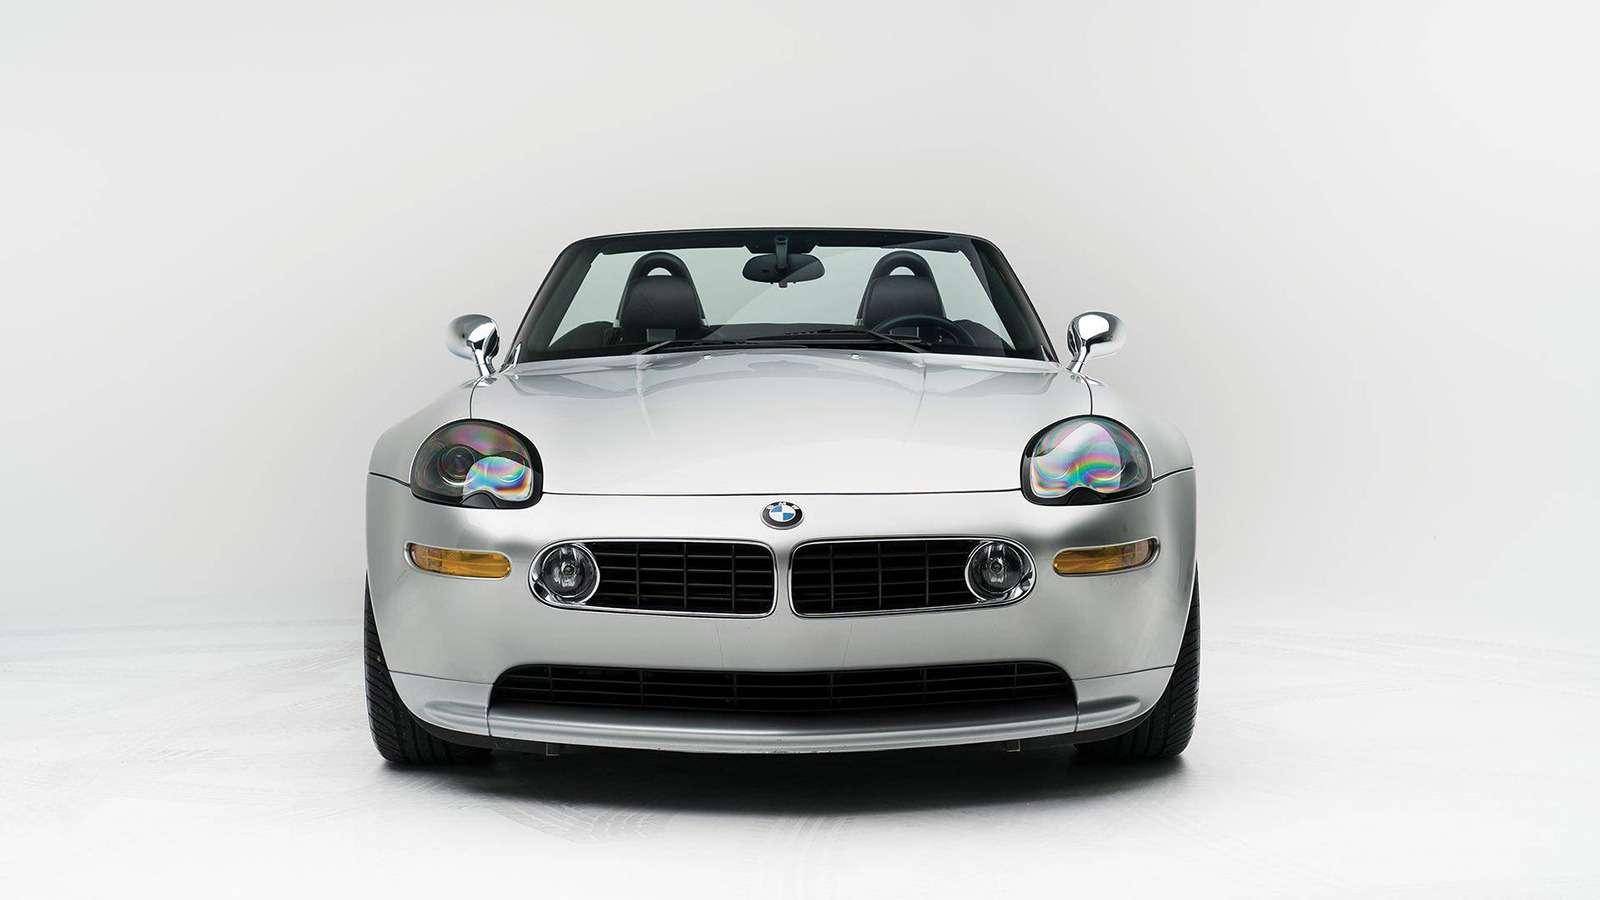 Автомобиль Стива Джобса продадут саукциона. Вместе стелефоном (ноэто неiPhone)— фото 811154